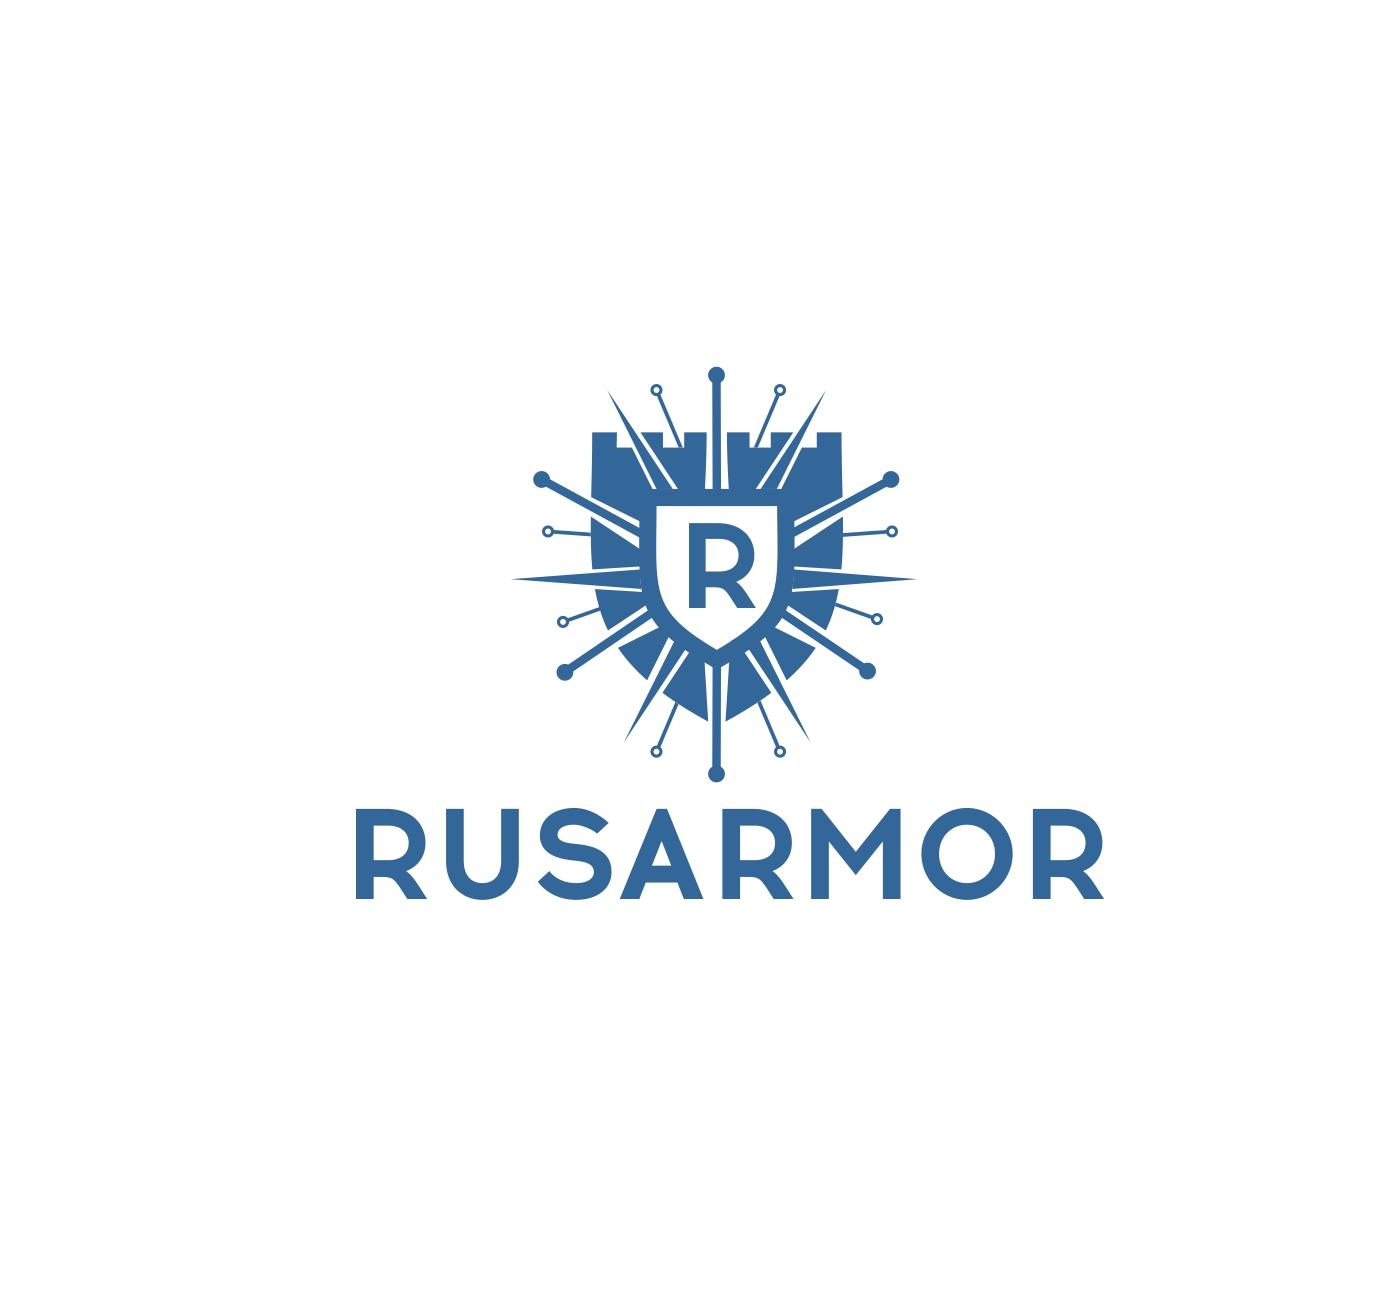 Разработка логотипа технологического стартапа РУСАРМОР фото f_1235a06aa1e84e5f.jpg